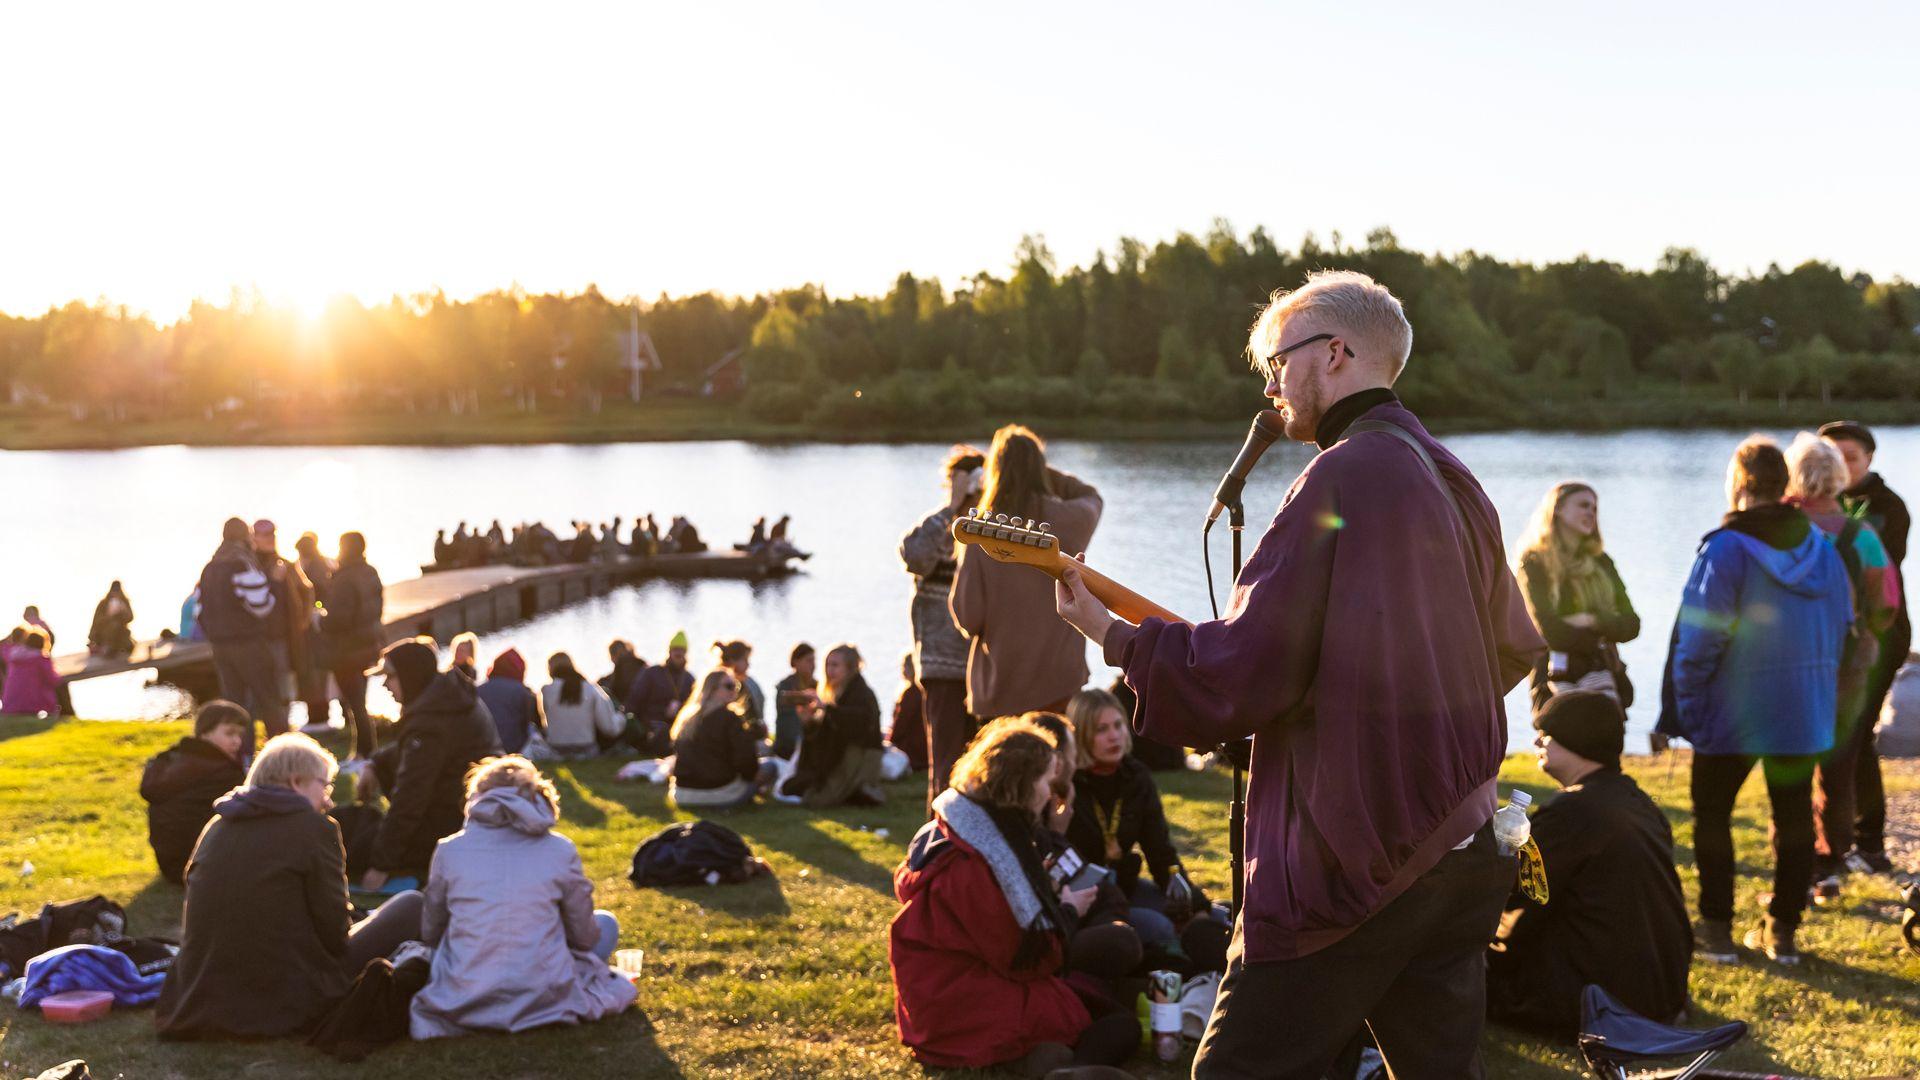 Lapland, Finland summer events